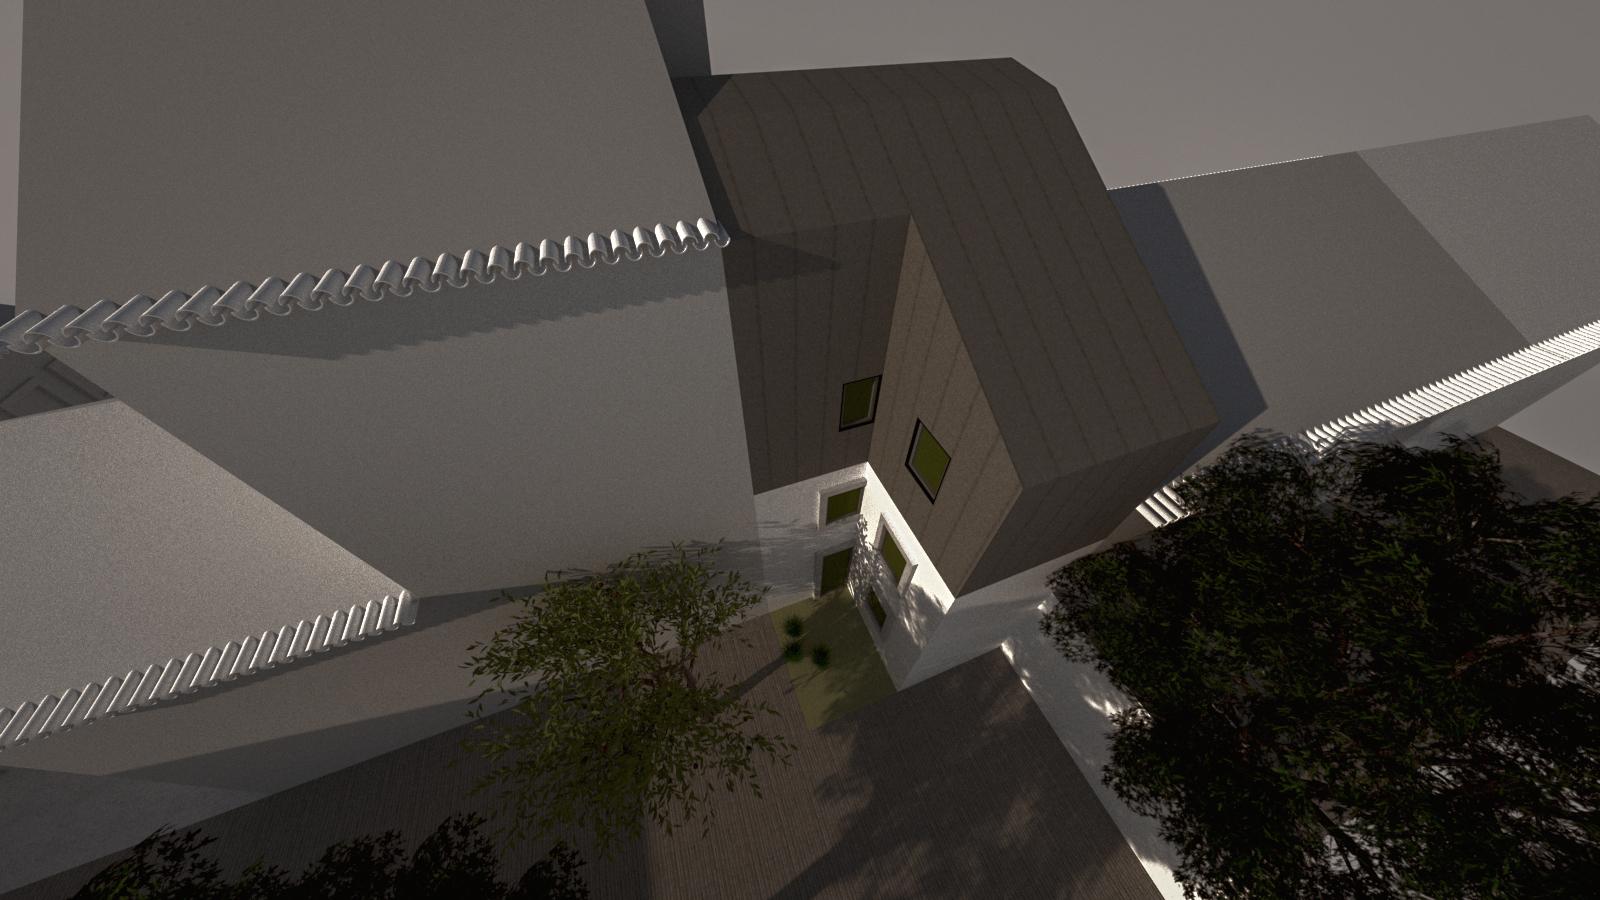 003 Peixinhos - Graça - Lisboa - Paulo Miguez Arquitectos.jpg